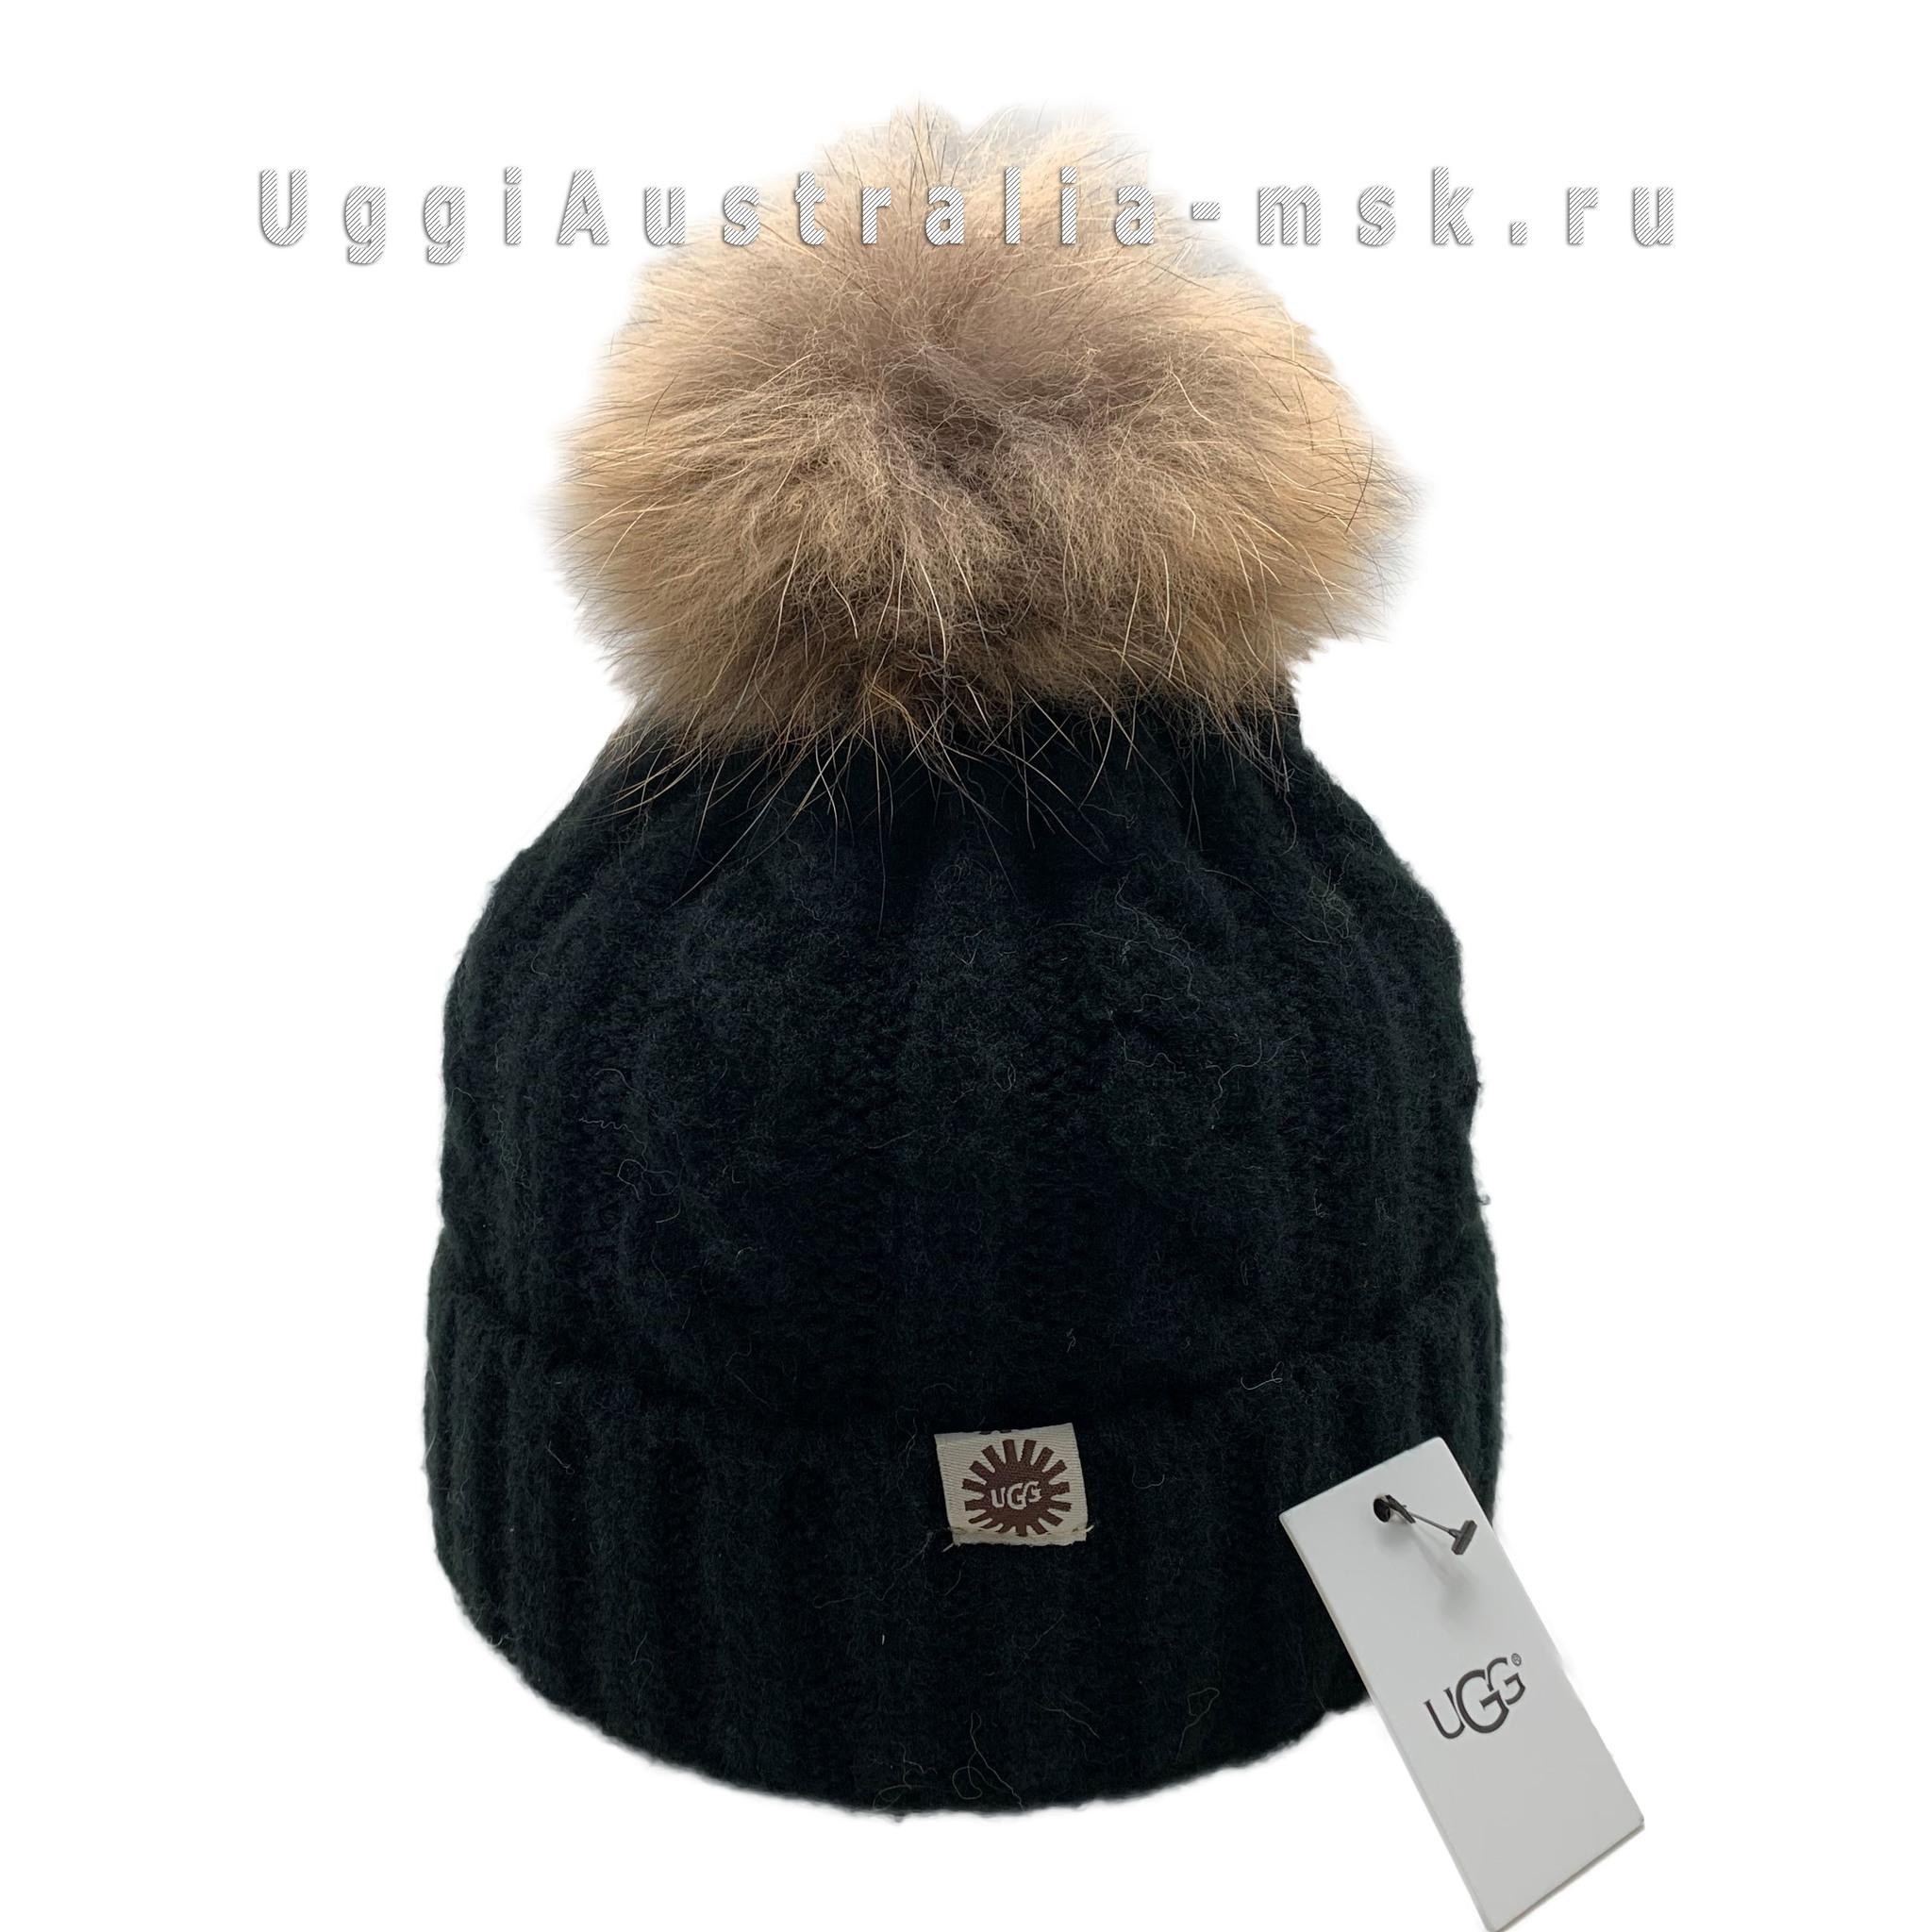 UGG Cap Black